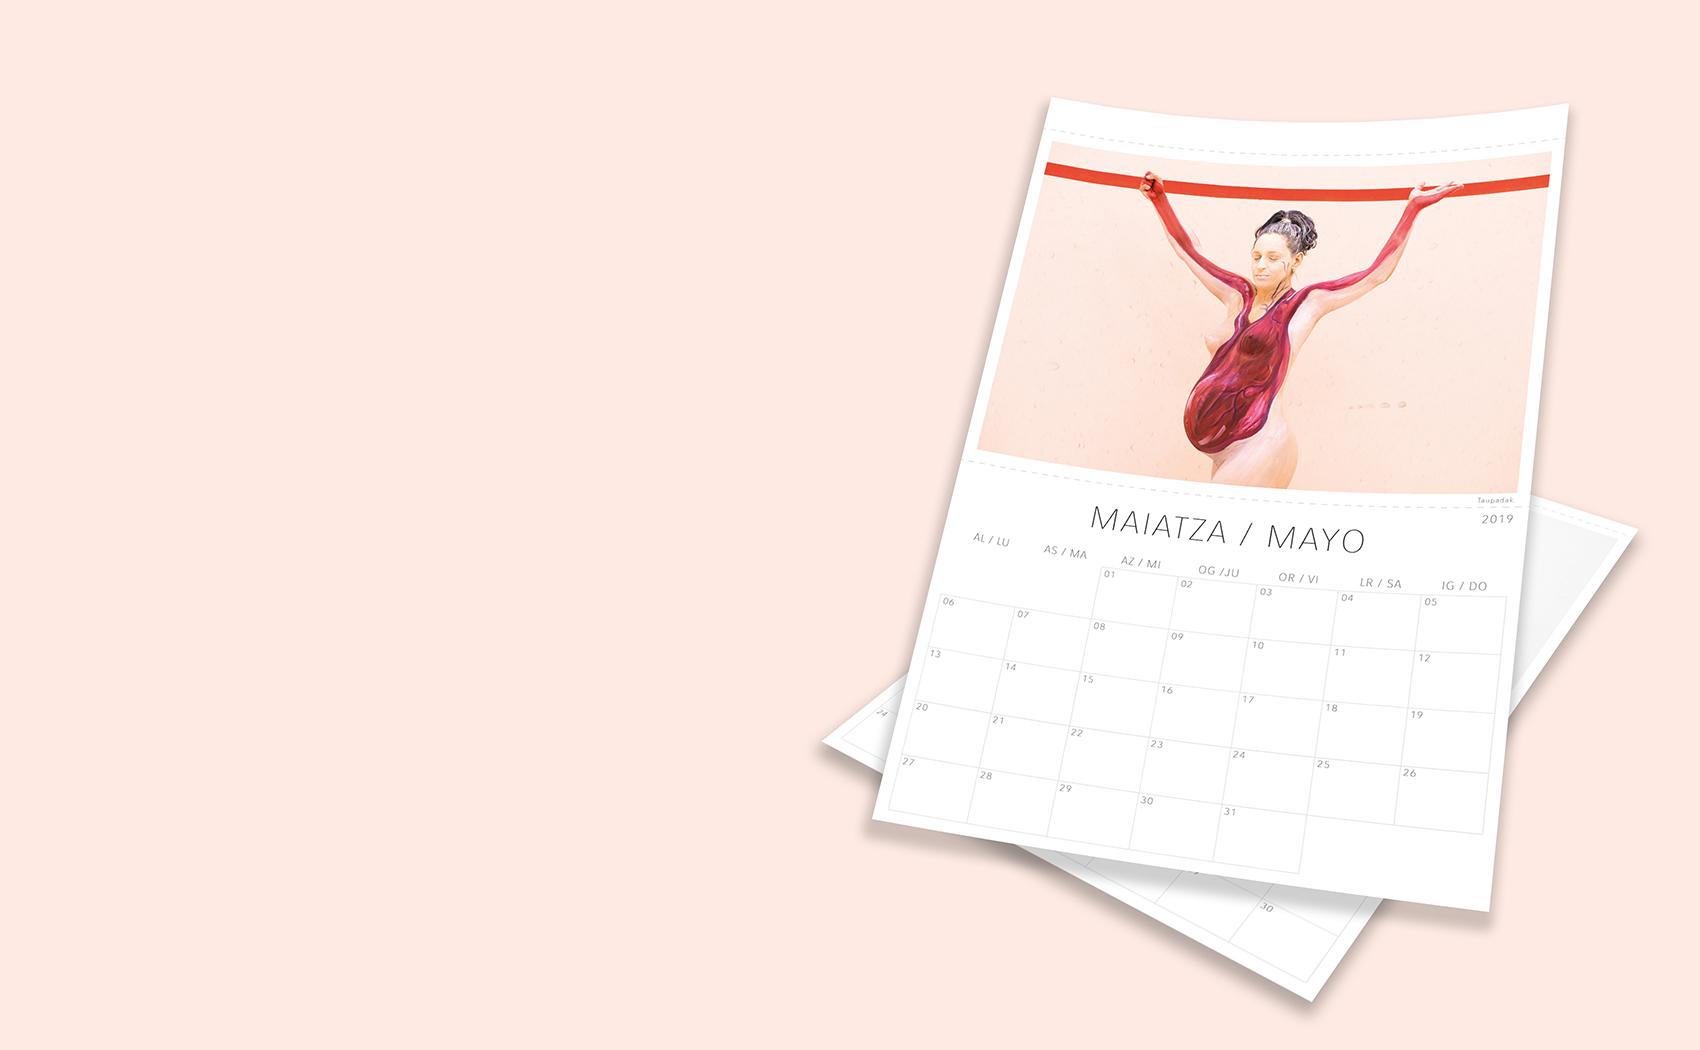 diseño-maquetacion-calendario-niksquash-deusto-trlt-trilatera